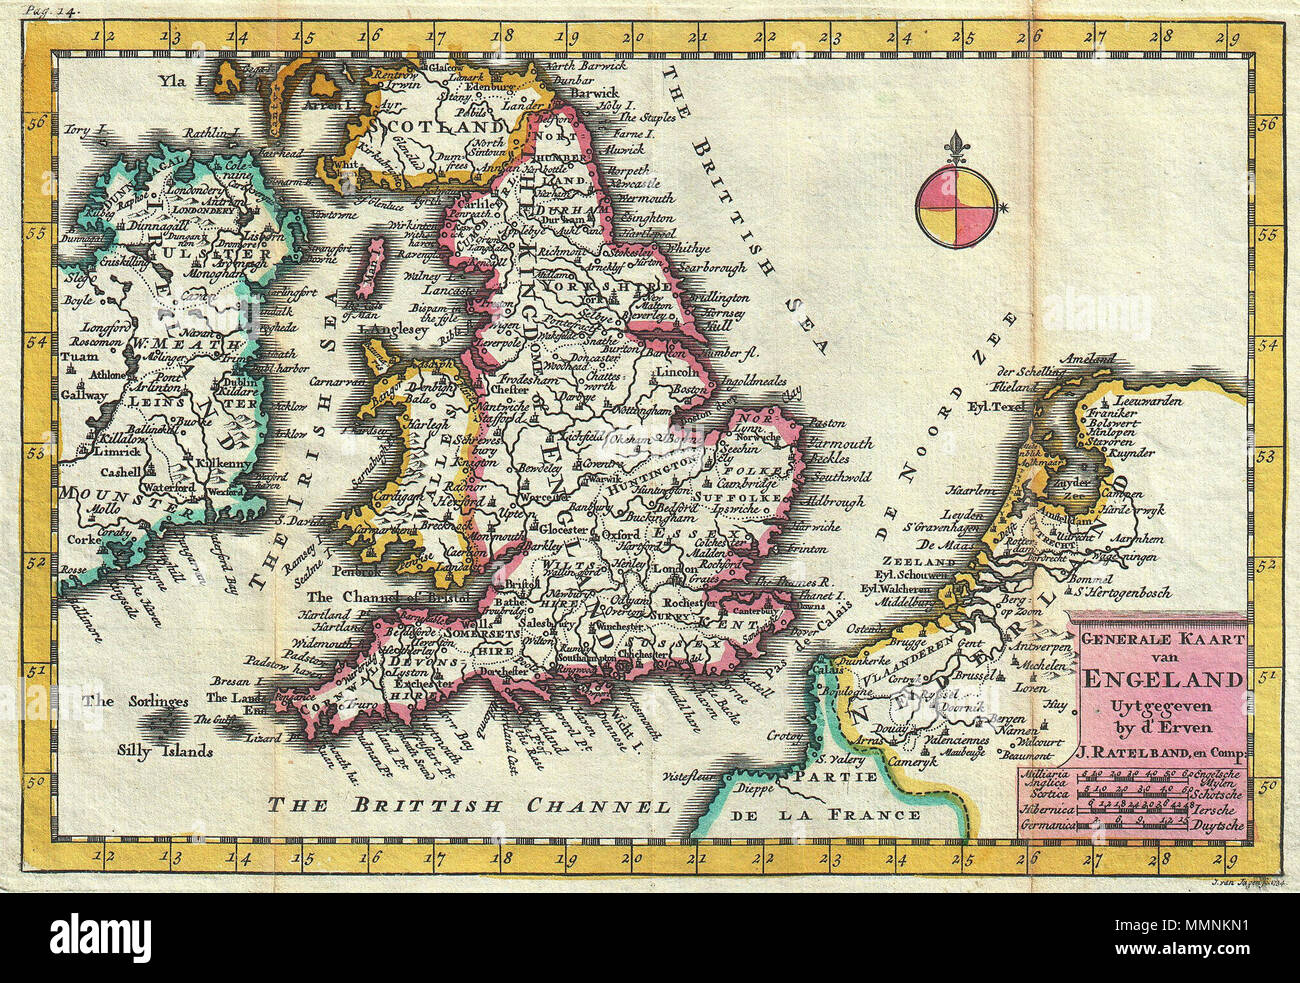 Carte Angleterre Pays Bas.Anglais Une Superbe Carte De L Angleterre D Abord Dessine